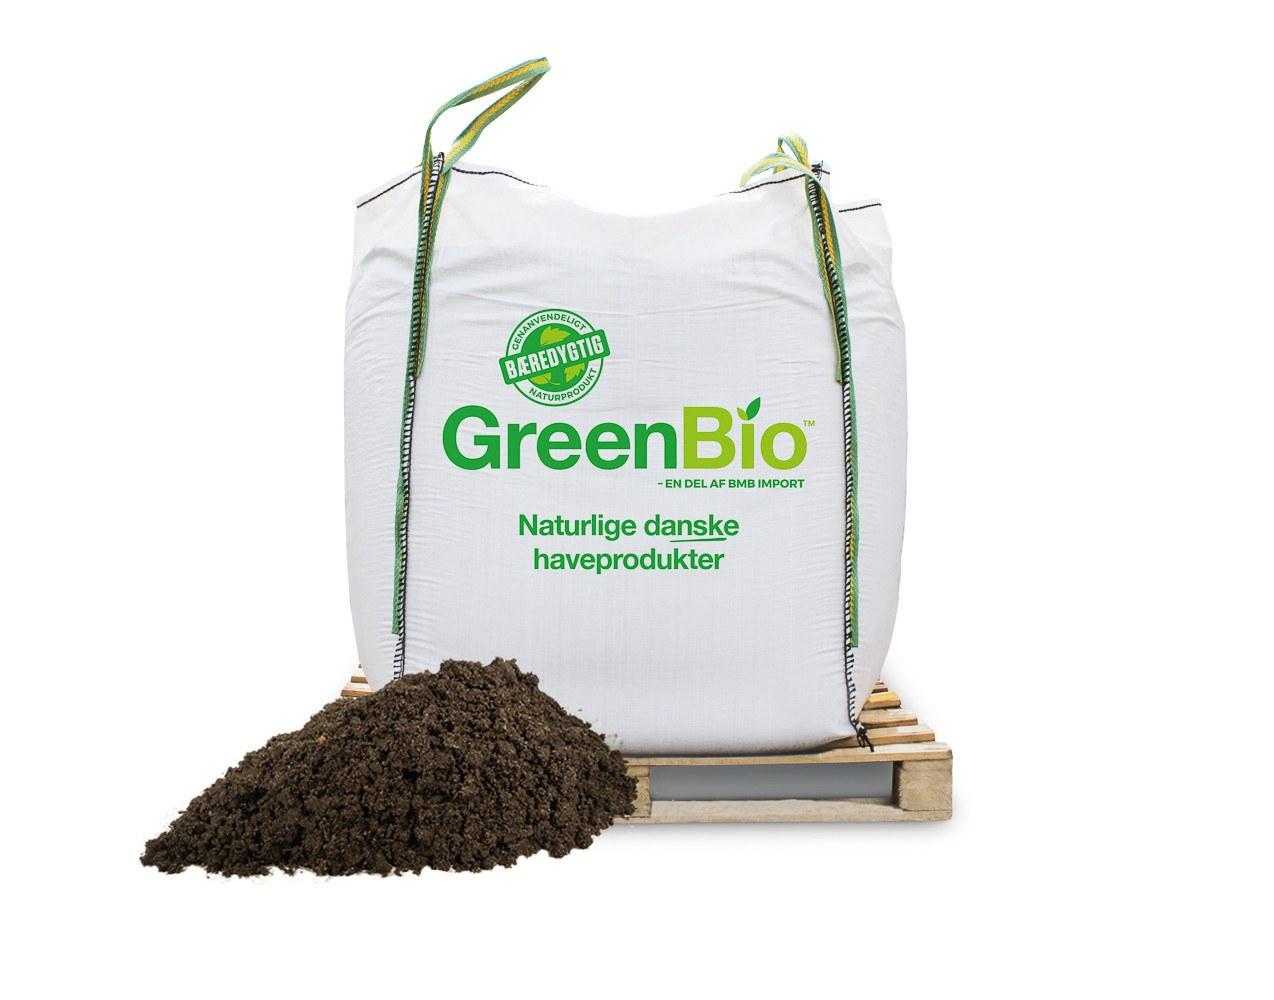 GreenBio Gartnermuld 0-20 mm. Bigbag á 1000 liter